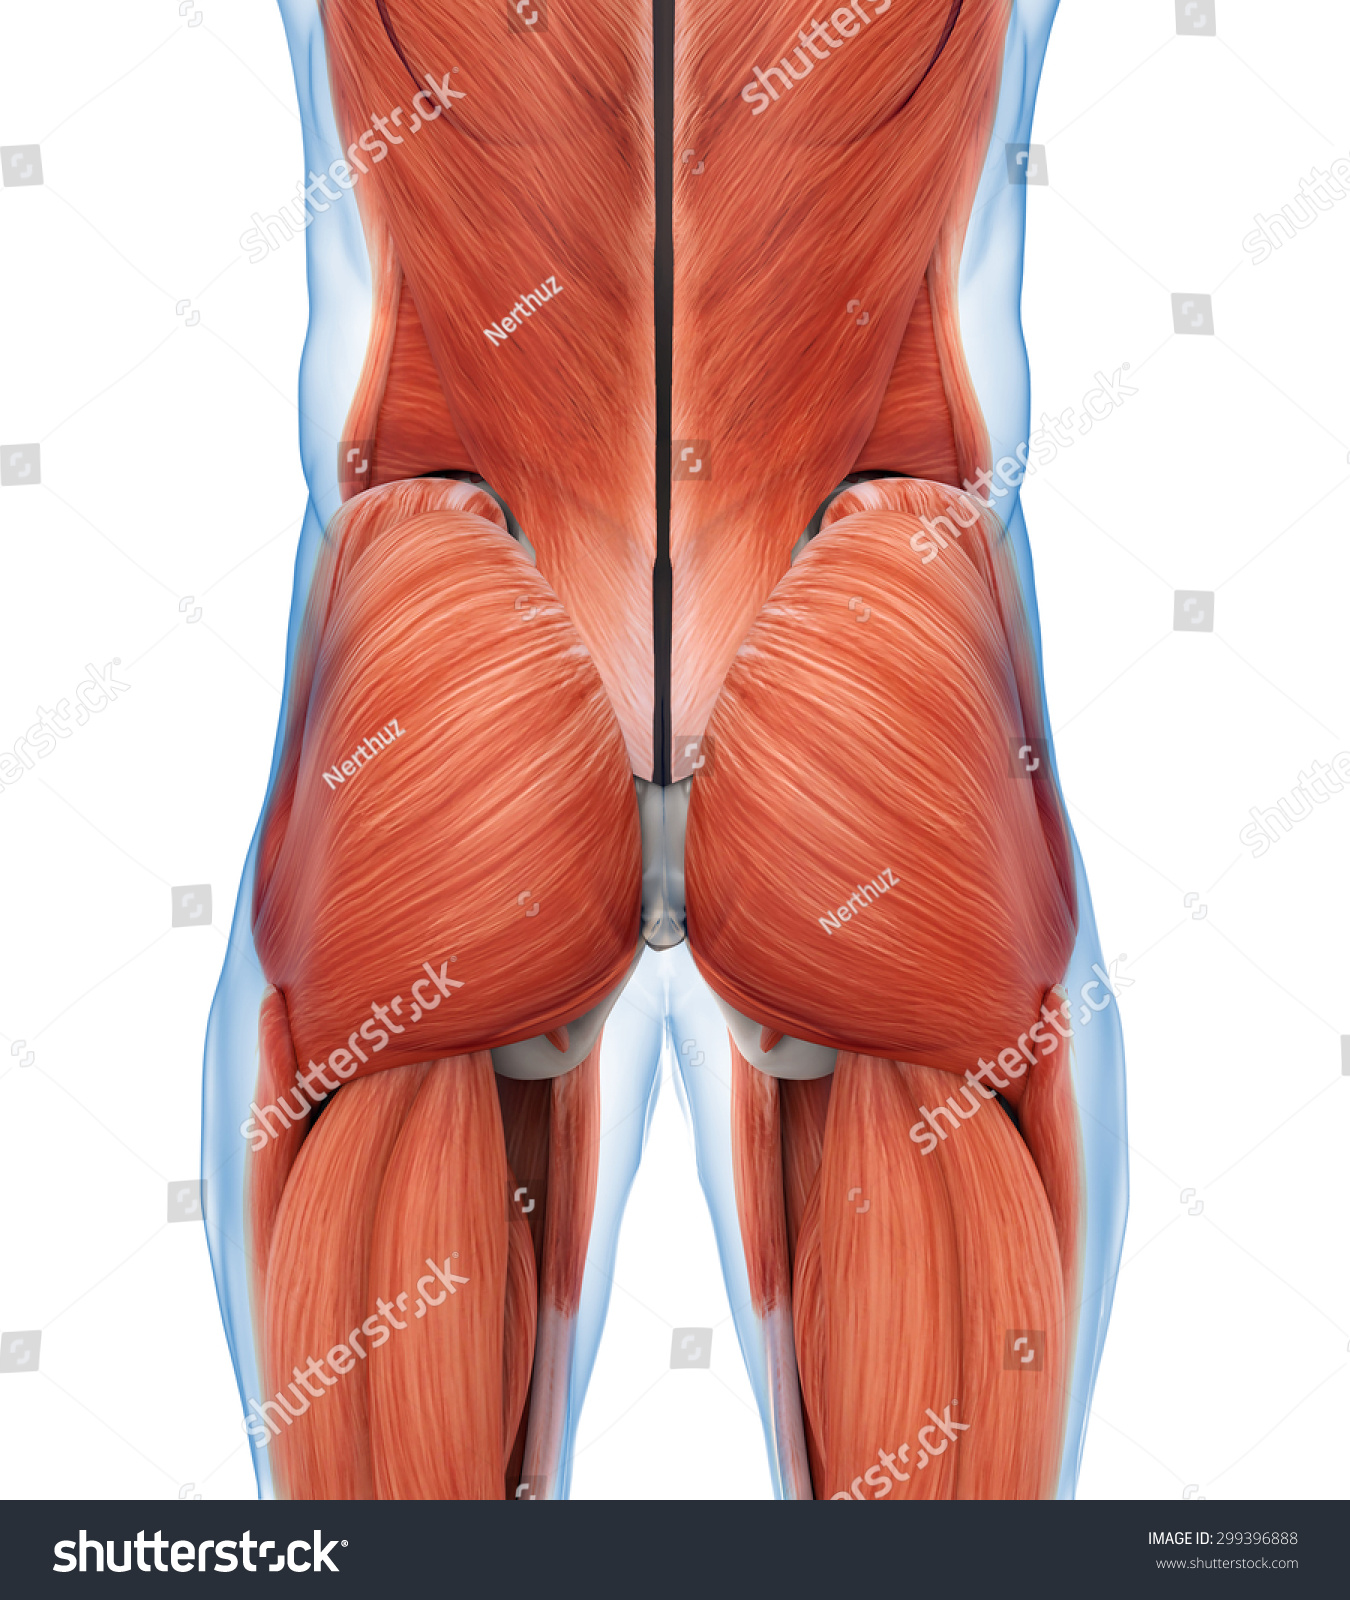 Anatomy of buttocks diagram